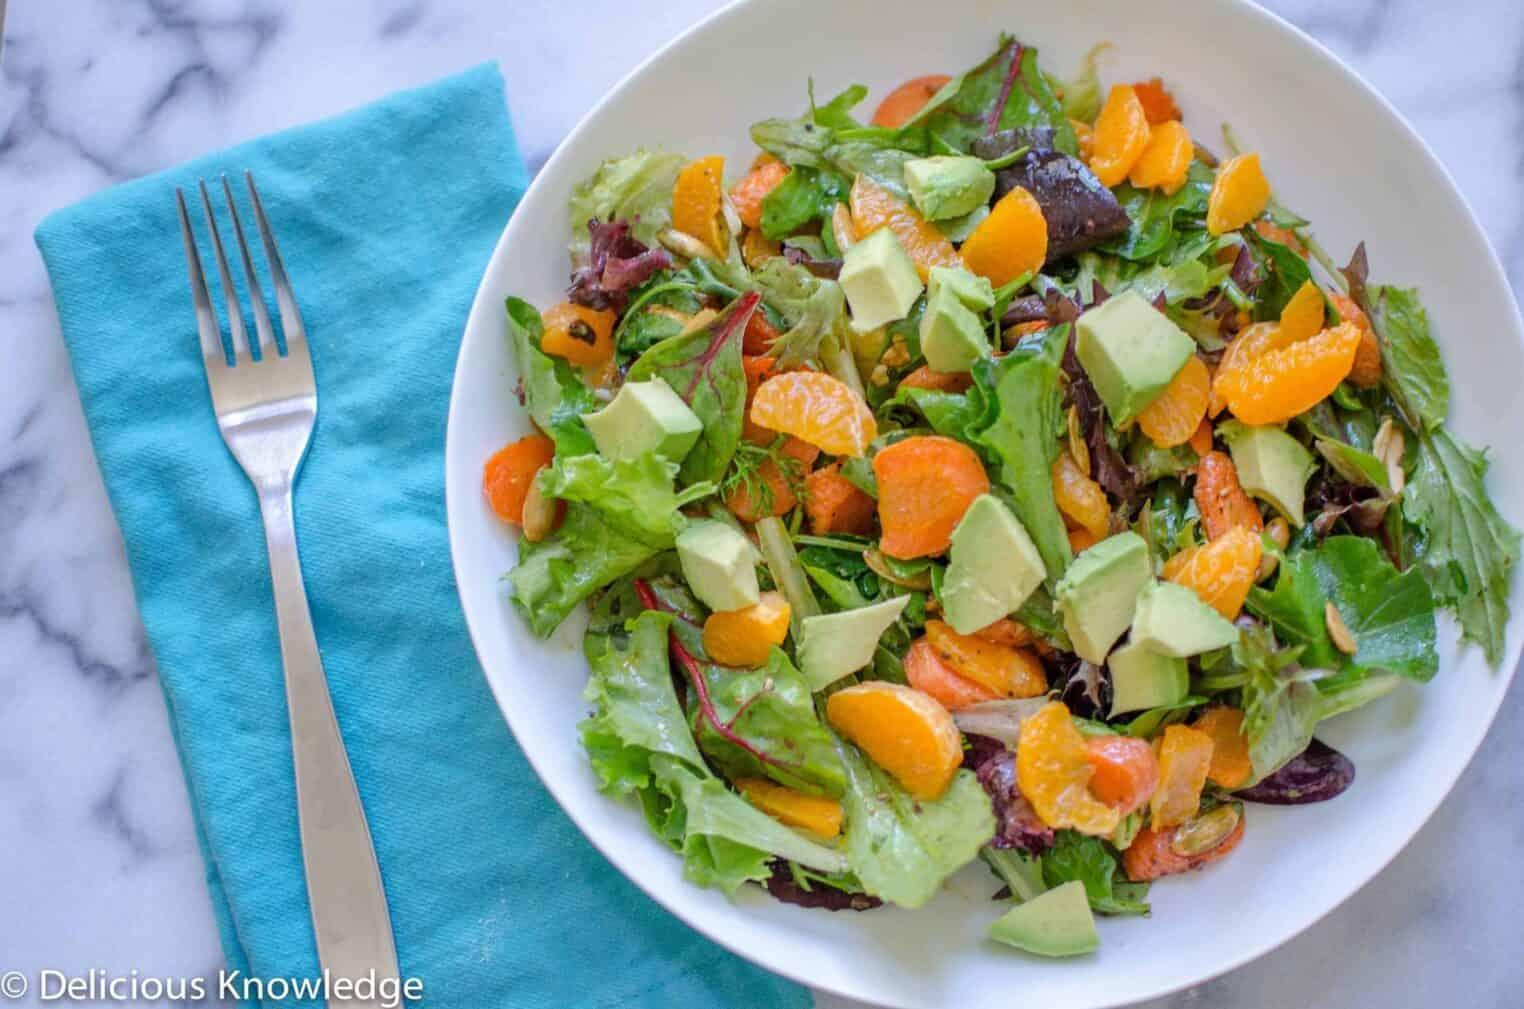 pepita salad with avocado and oranges